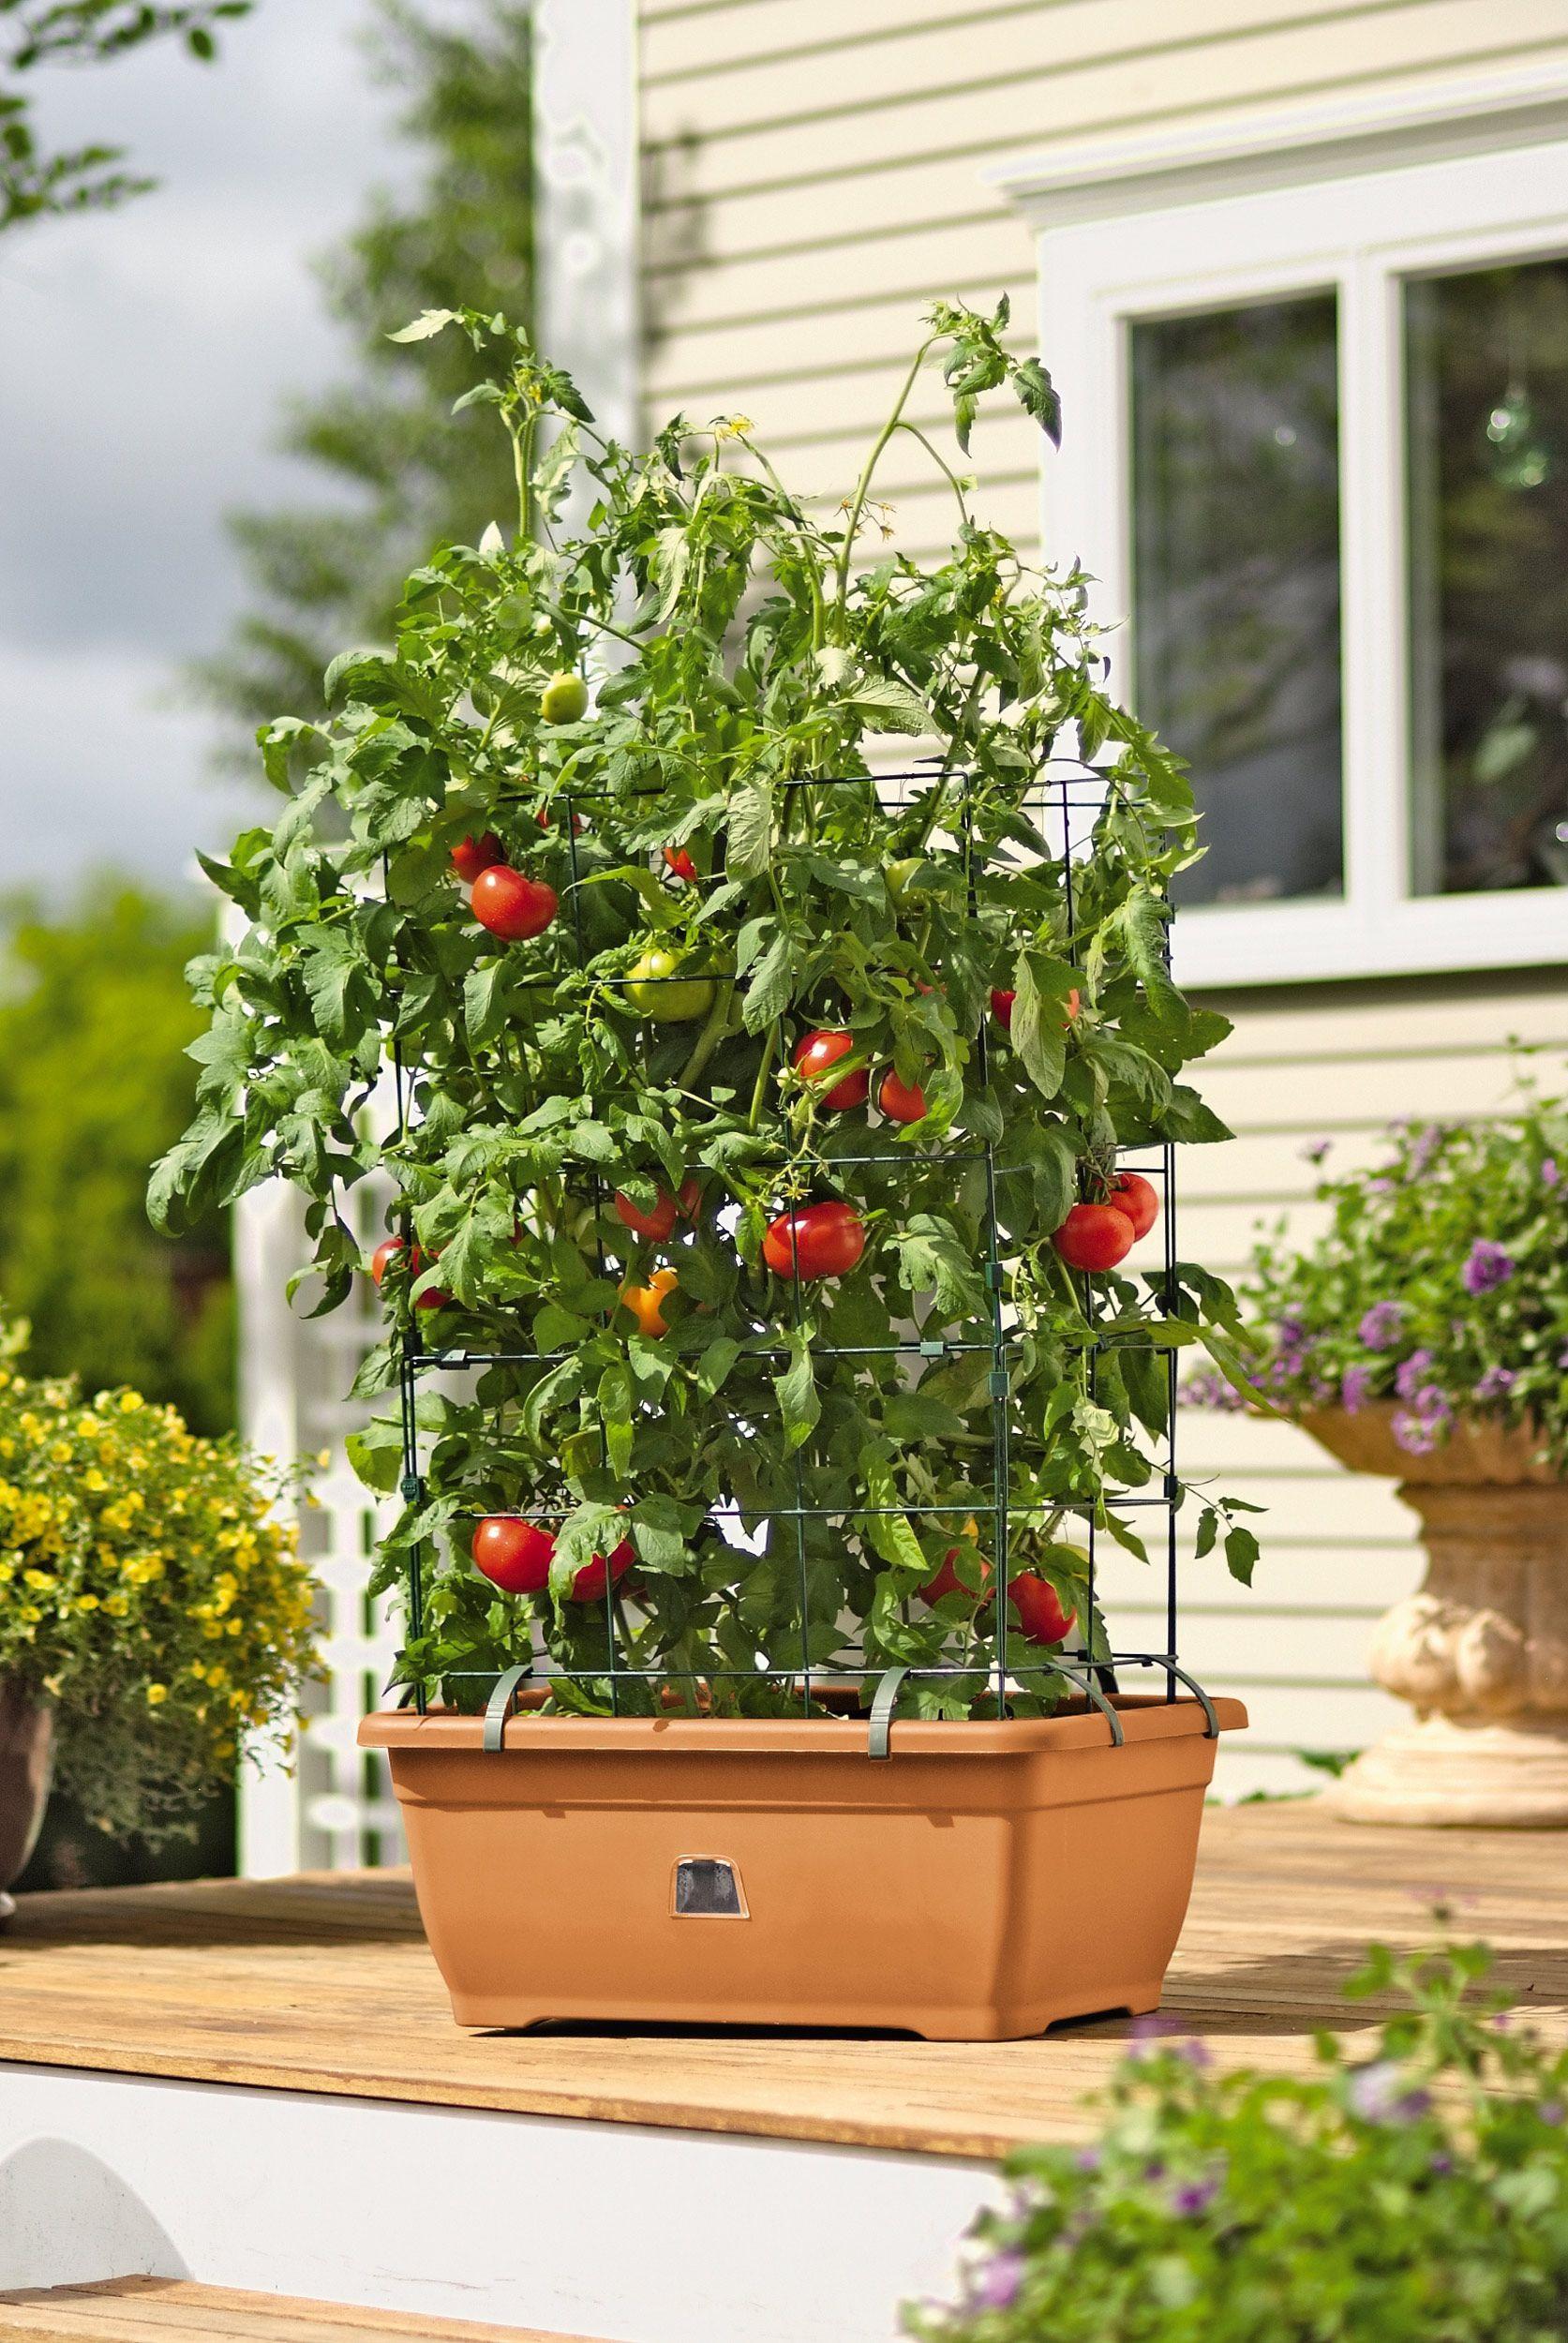 Tomato Planter Organic Tomato Success Kit Gardeners 400 x 300